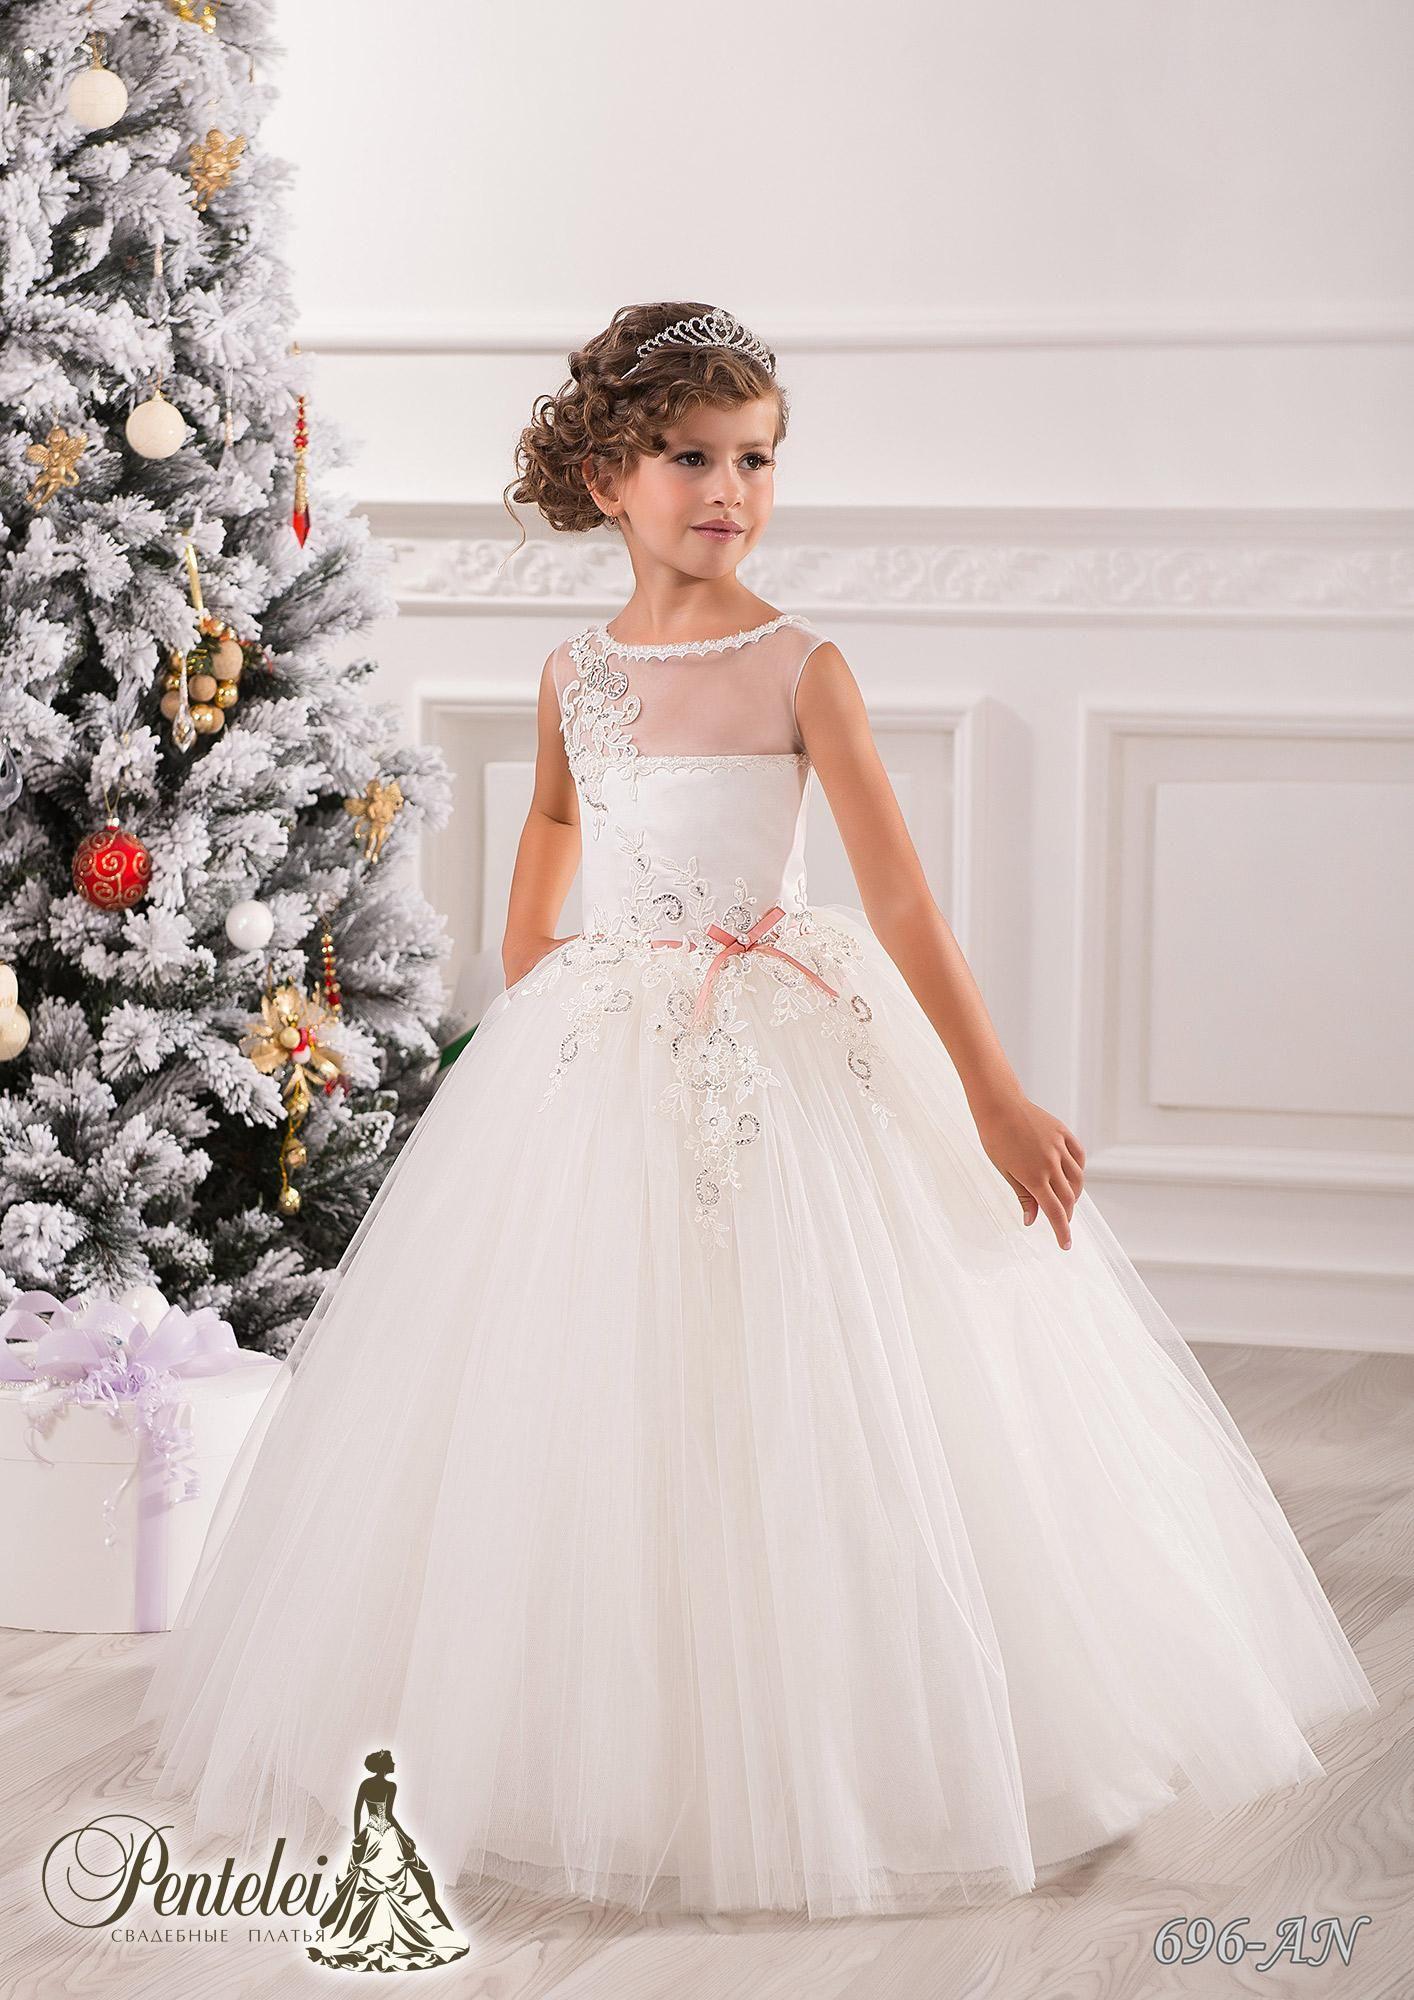 Cheap 2018 Flower Girls Dresses First Communion Dresses